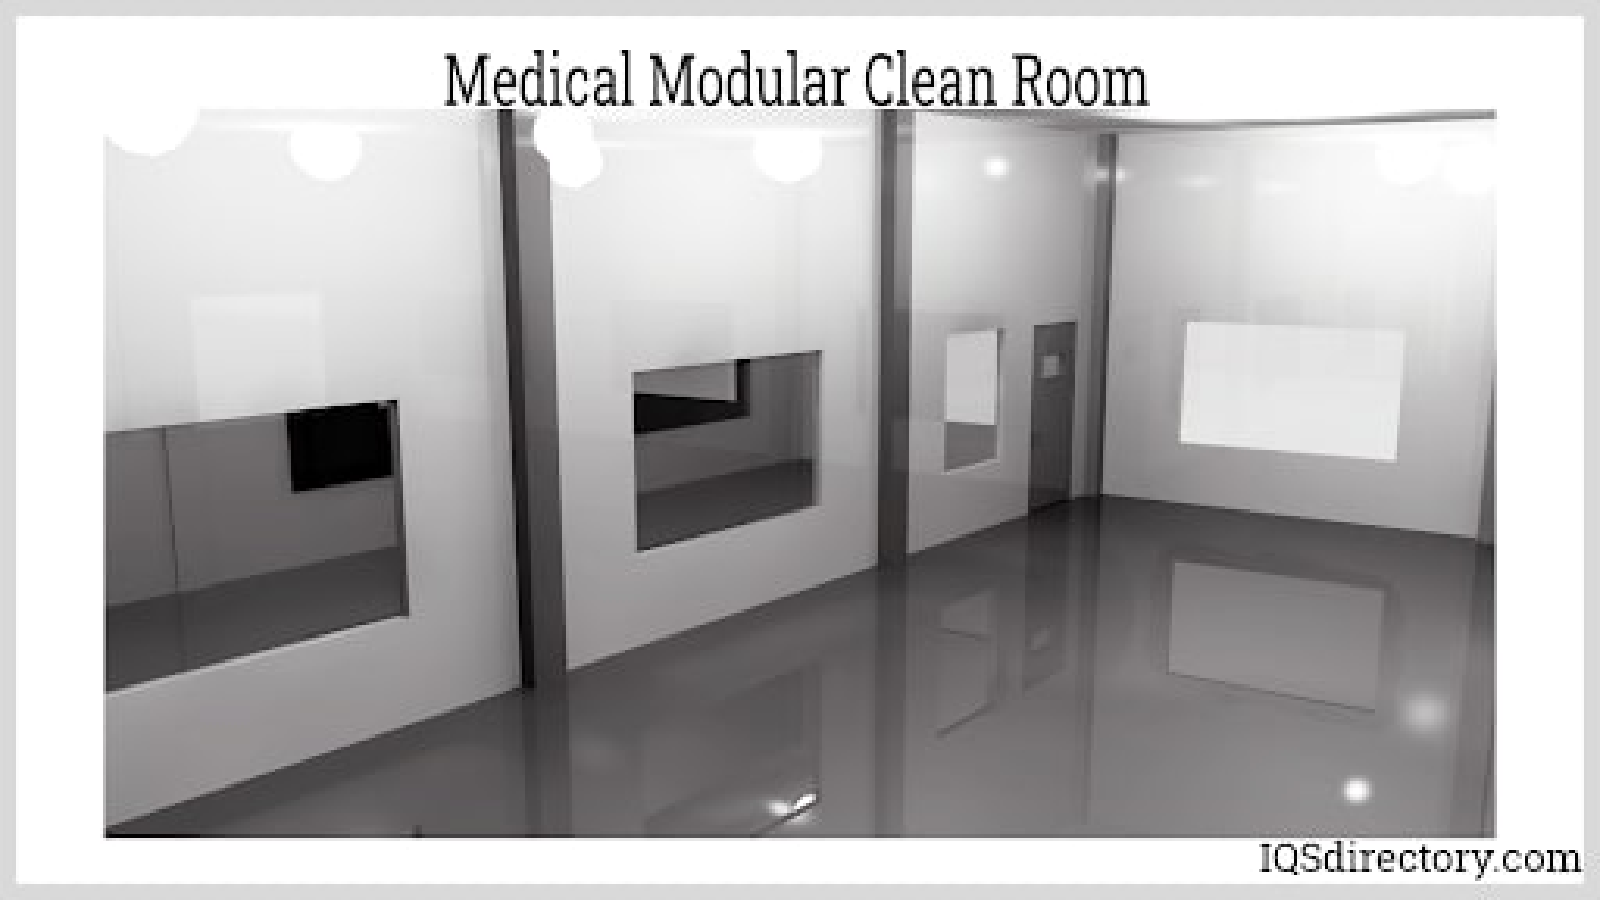 Medical Modular Clean Room